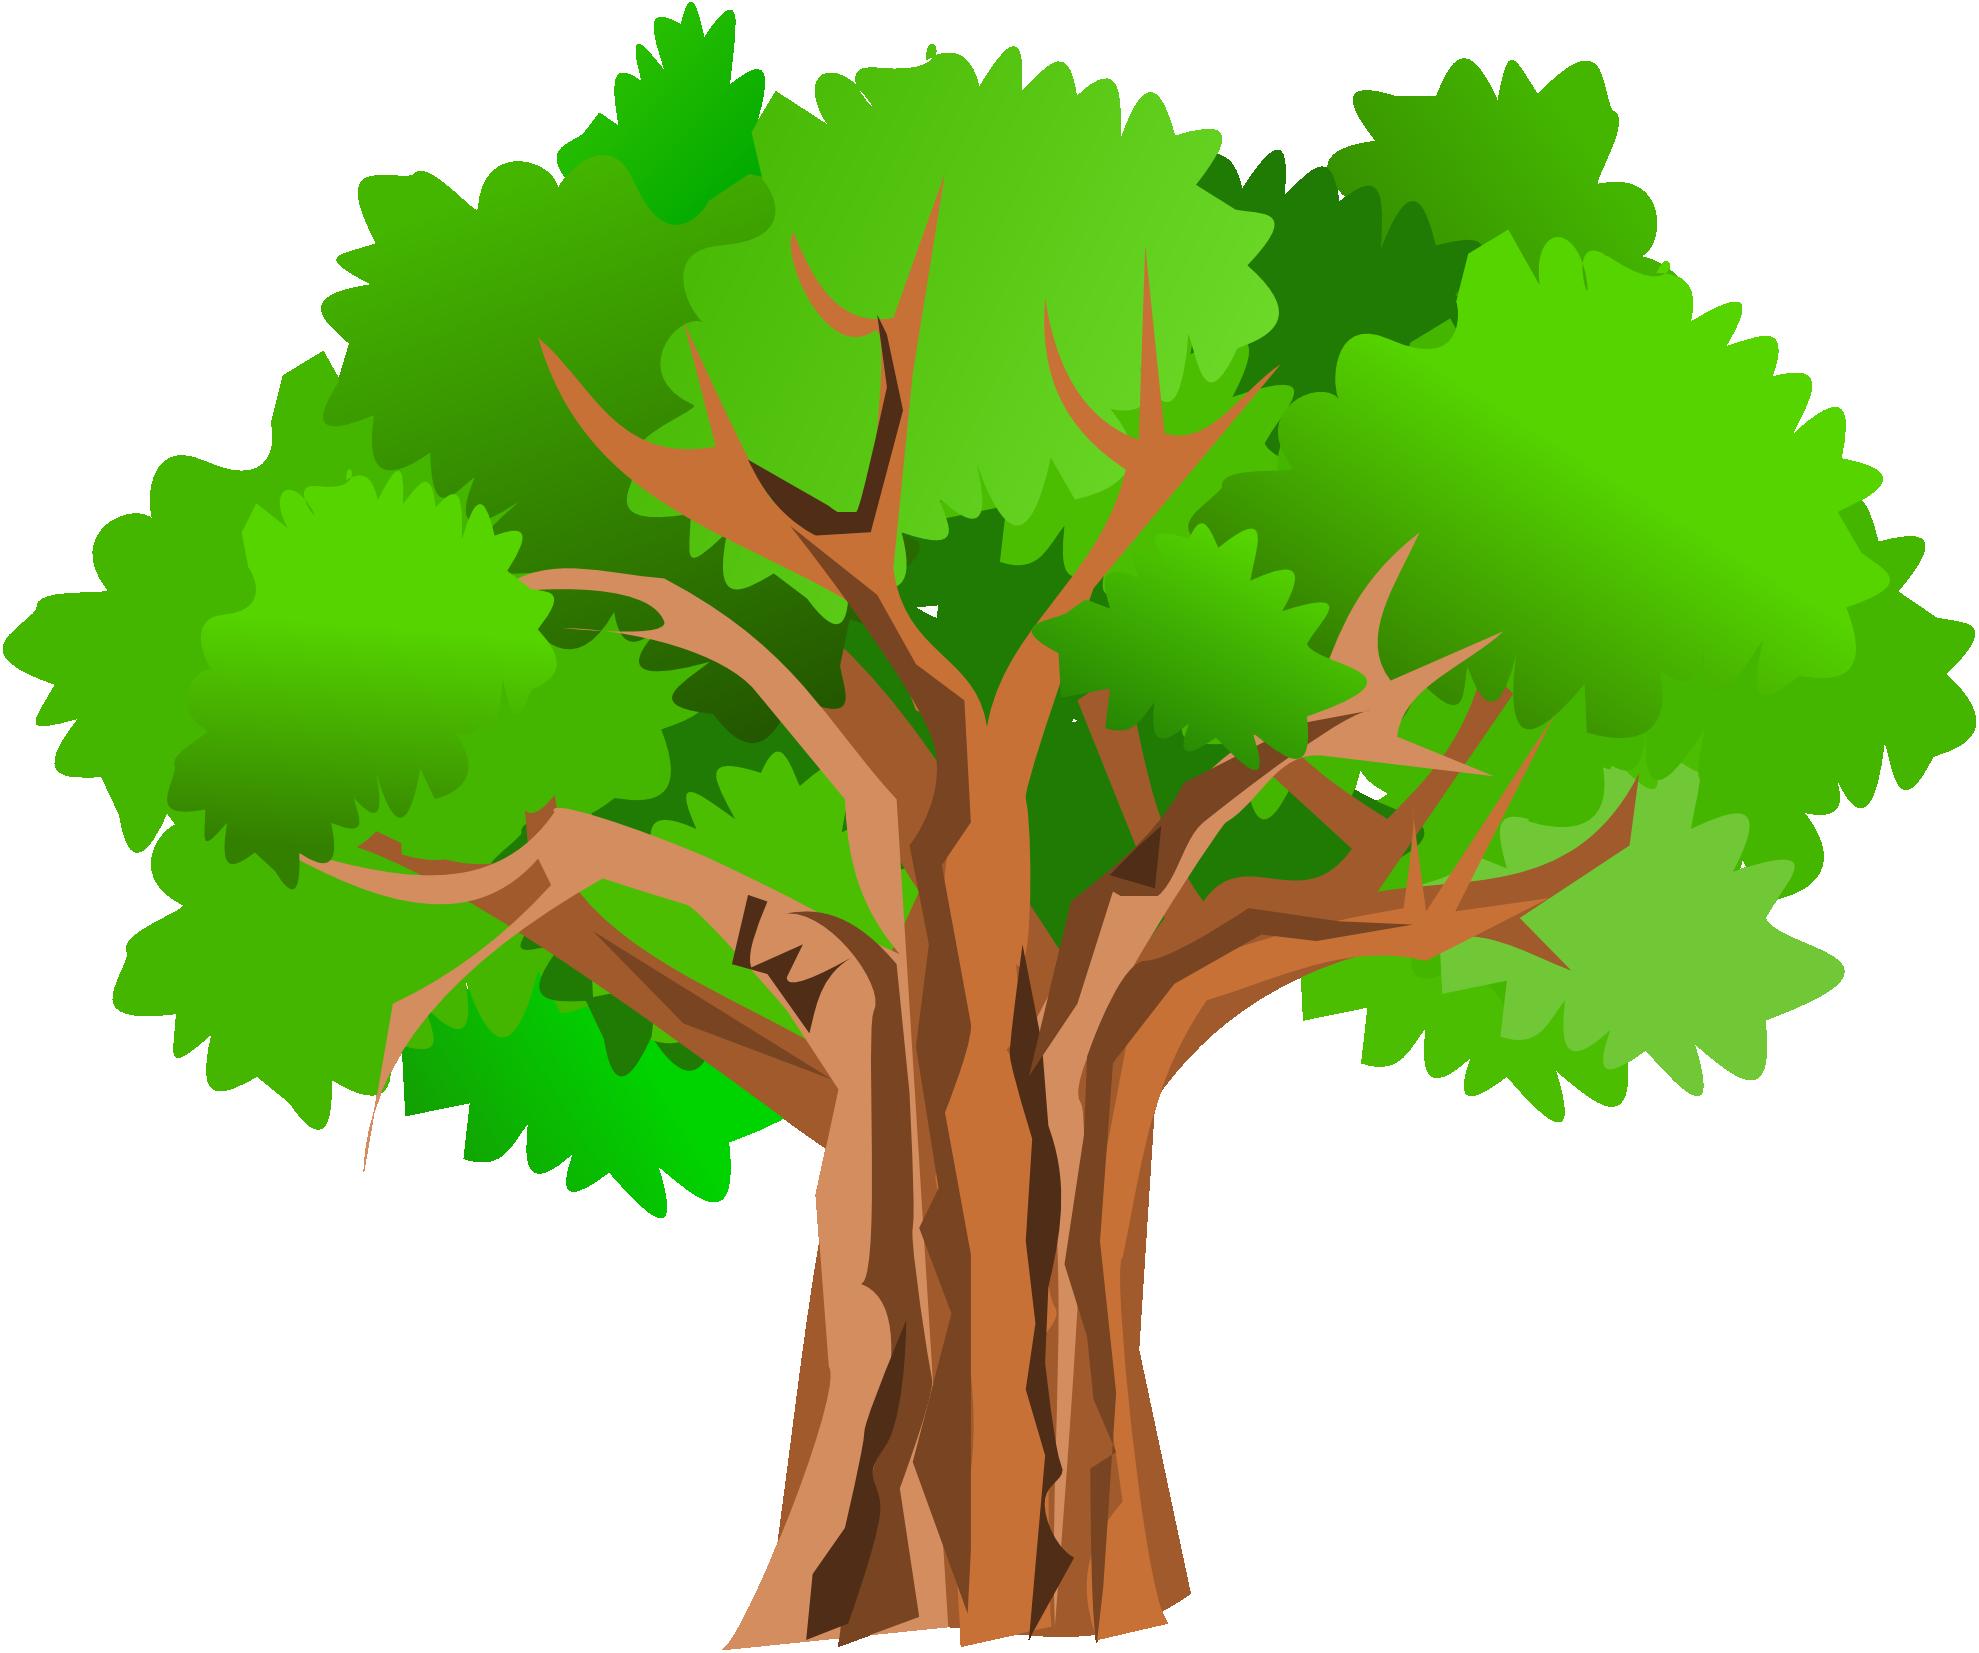 Life clipart oak tree, Life oak tree Transparent FREE for.